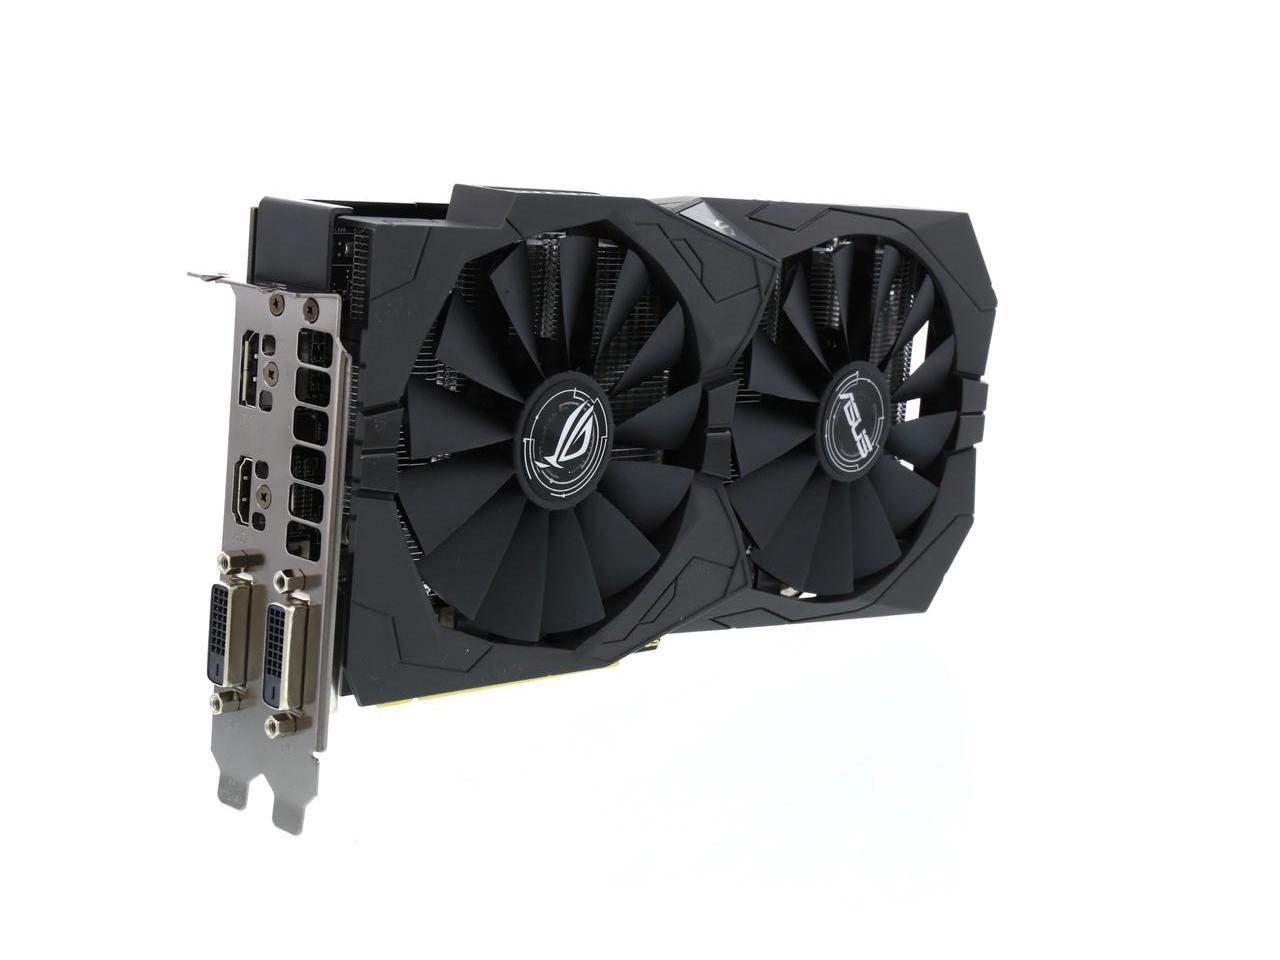 ASUS ROG Strix Radeon RX 570 O4G $189.99 AR